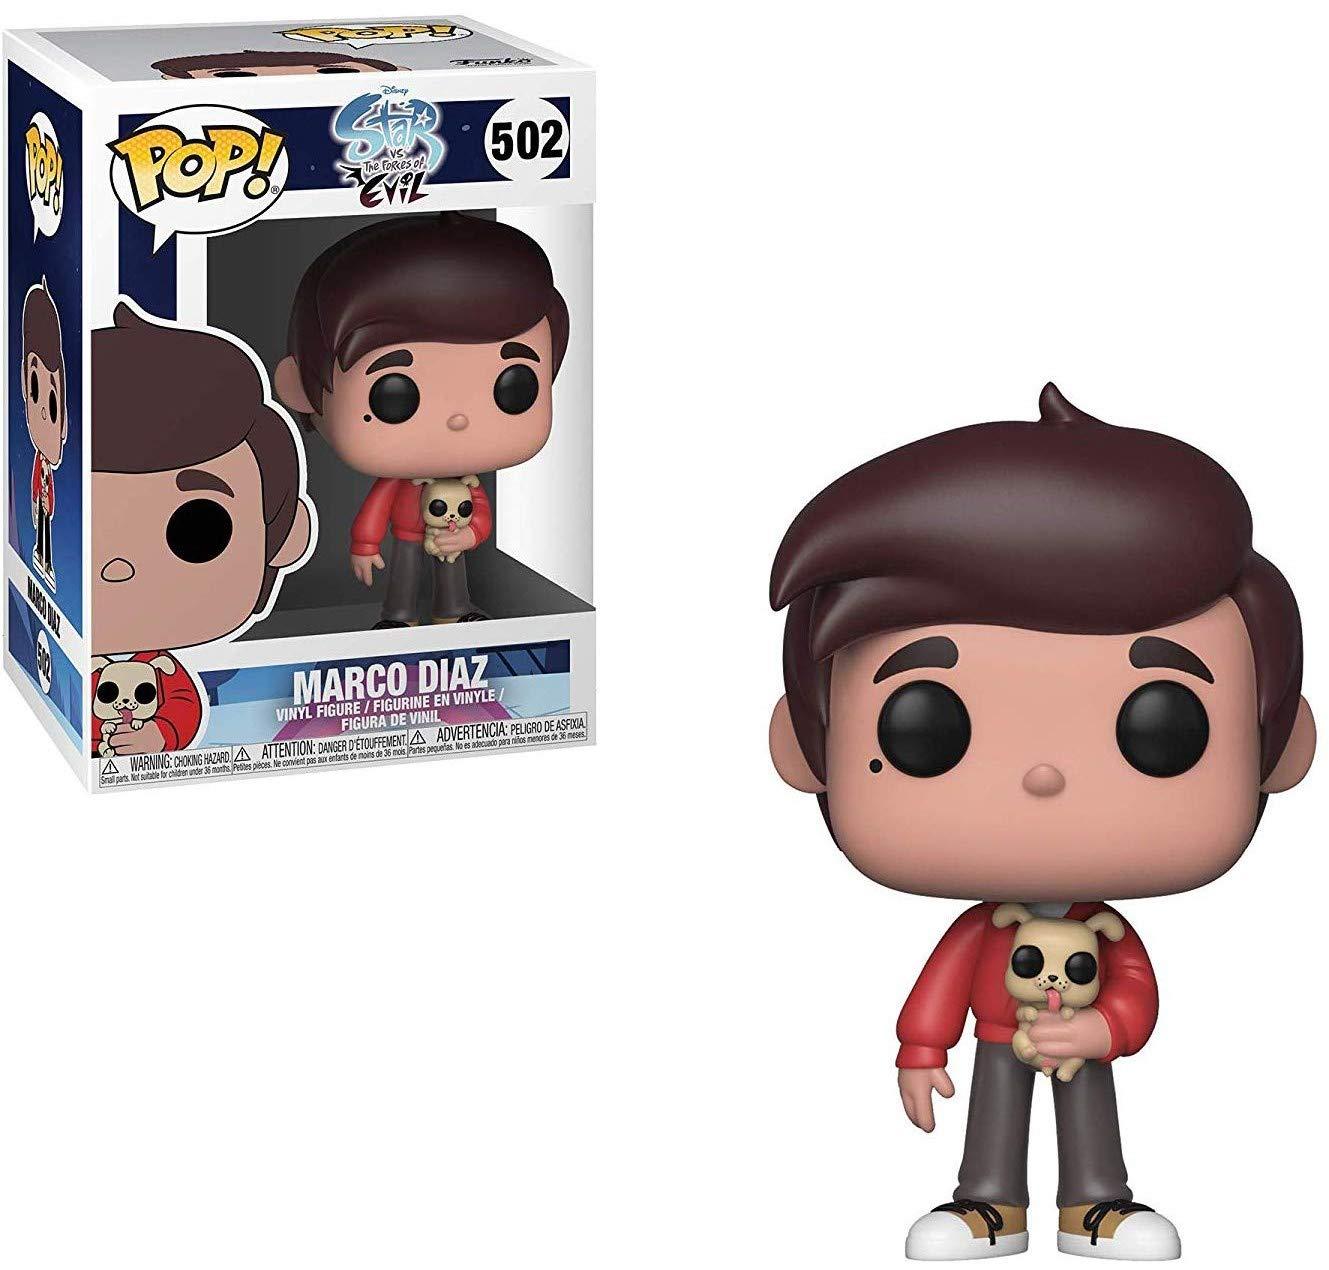 The Forces of Evil Vinyl Figure Disney: Star vs Marco Diaz Funko Pop Includes Compatible Pop Box Protector Case